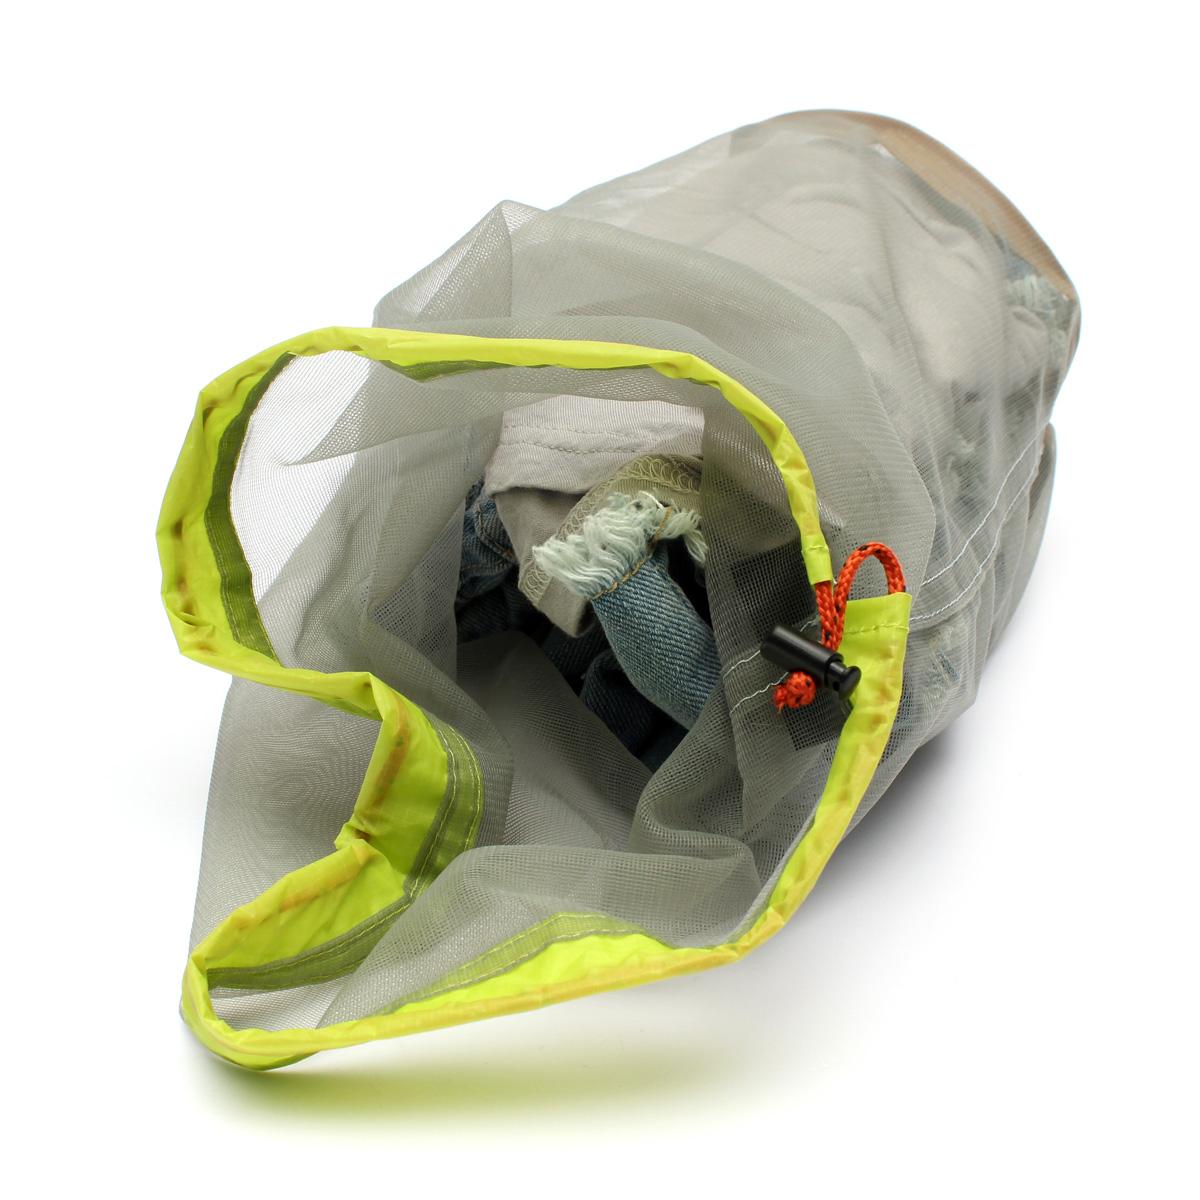 Tavel Camping Hiking Sports Ultralight Mesh Stuff Sack Drawstring Nylon Mesh Bag